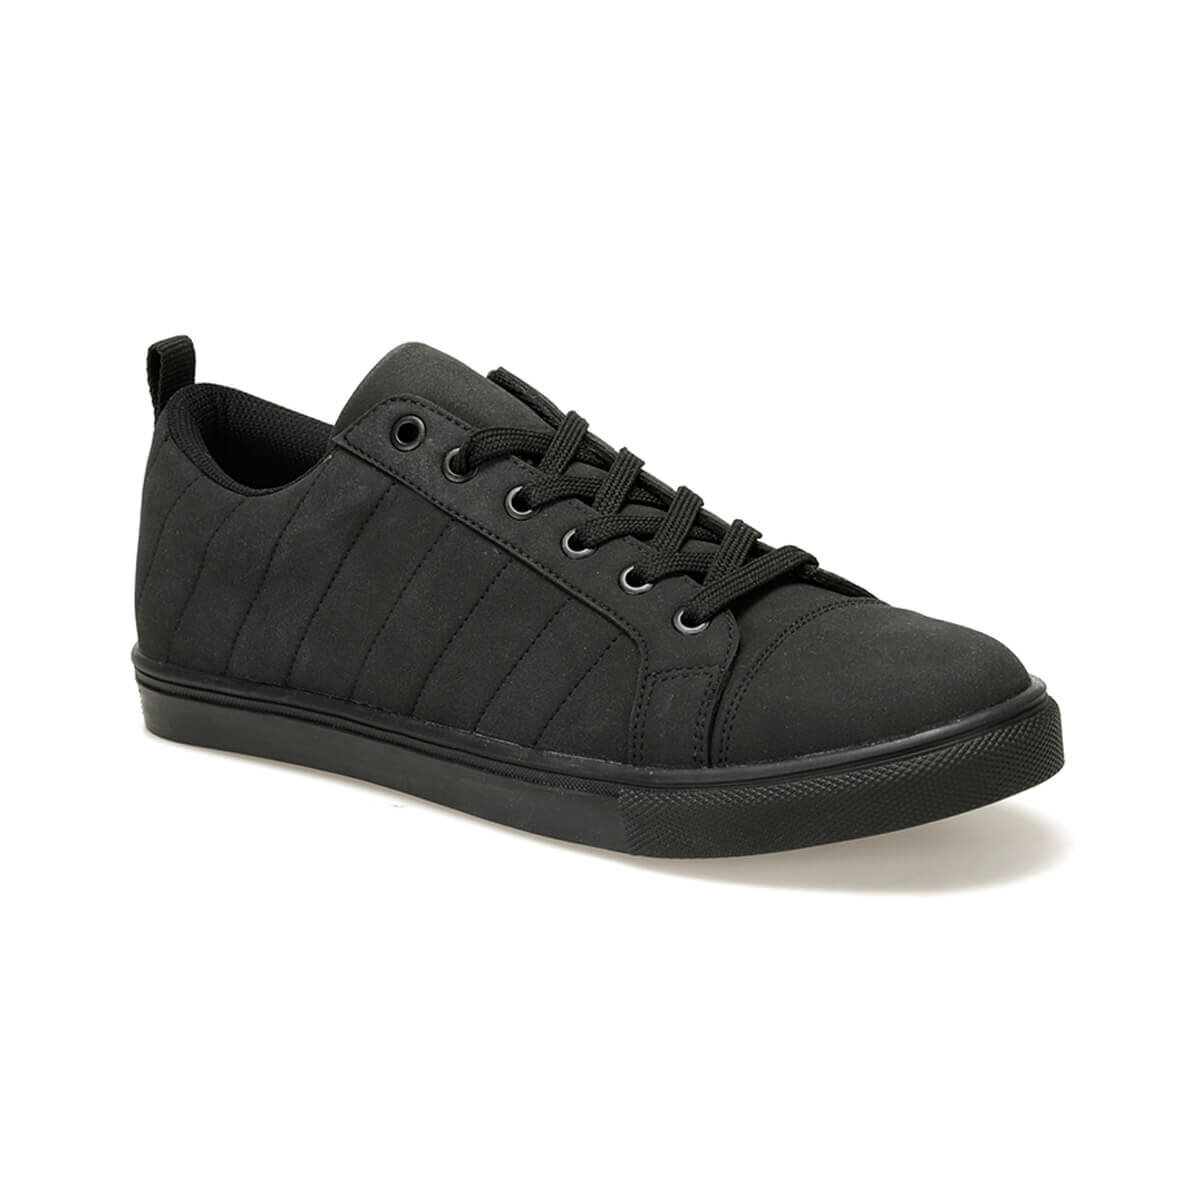 Flo KP-012 Zwarte Mannelijke Schoenen Panama Club